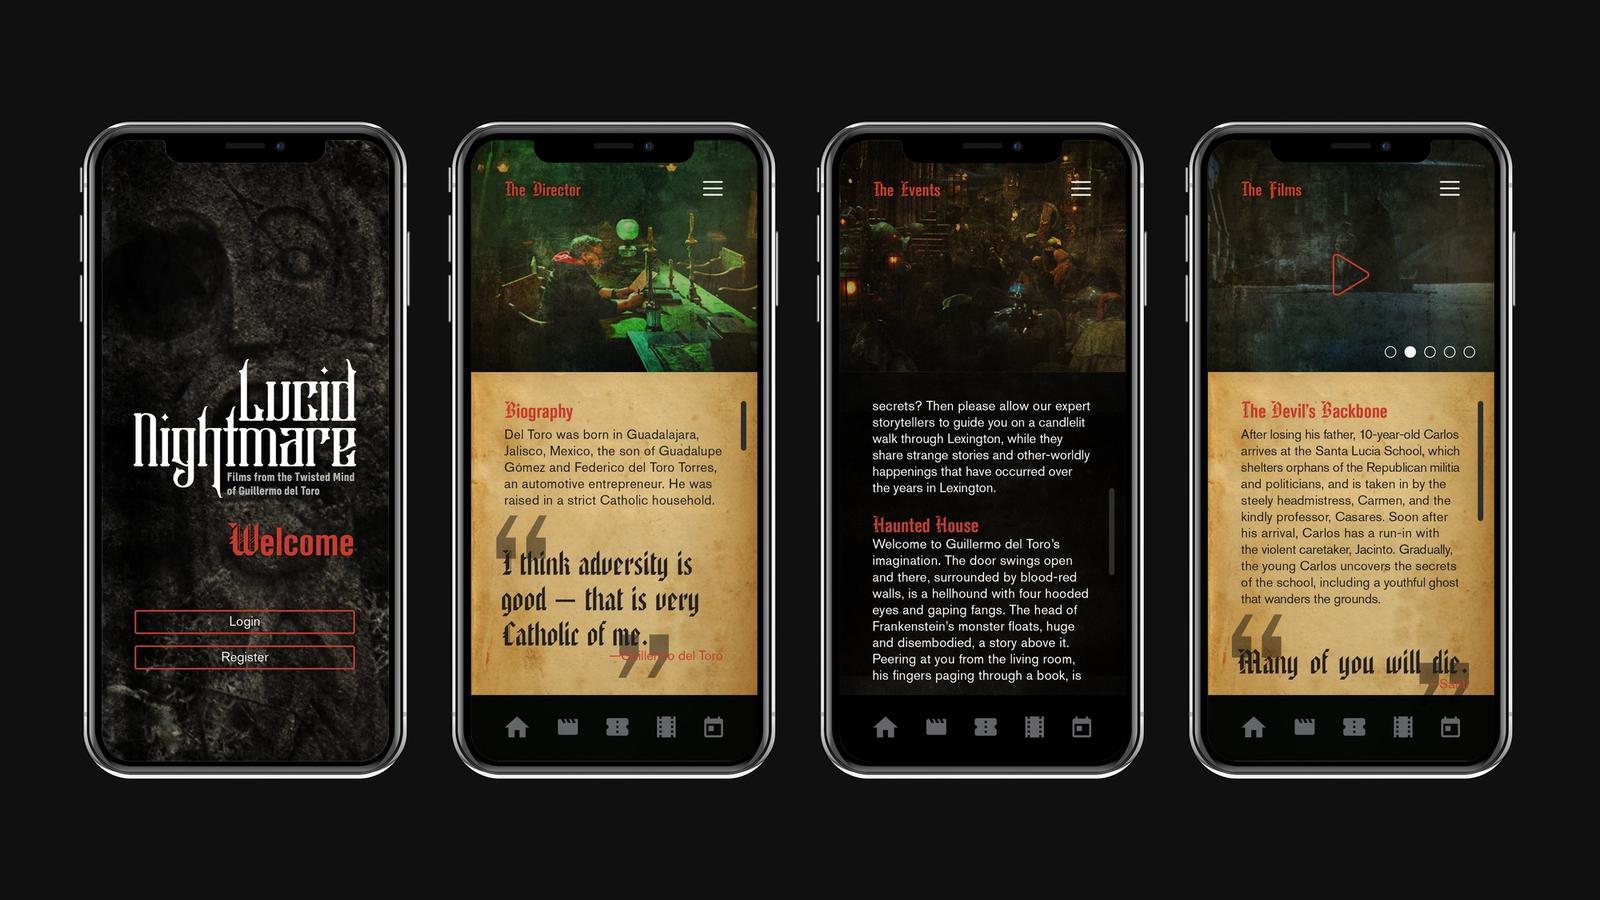 Lucid Nightmare // Guillermo del Toro Film Festival Mobile App